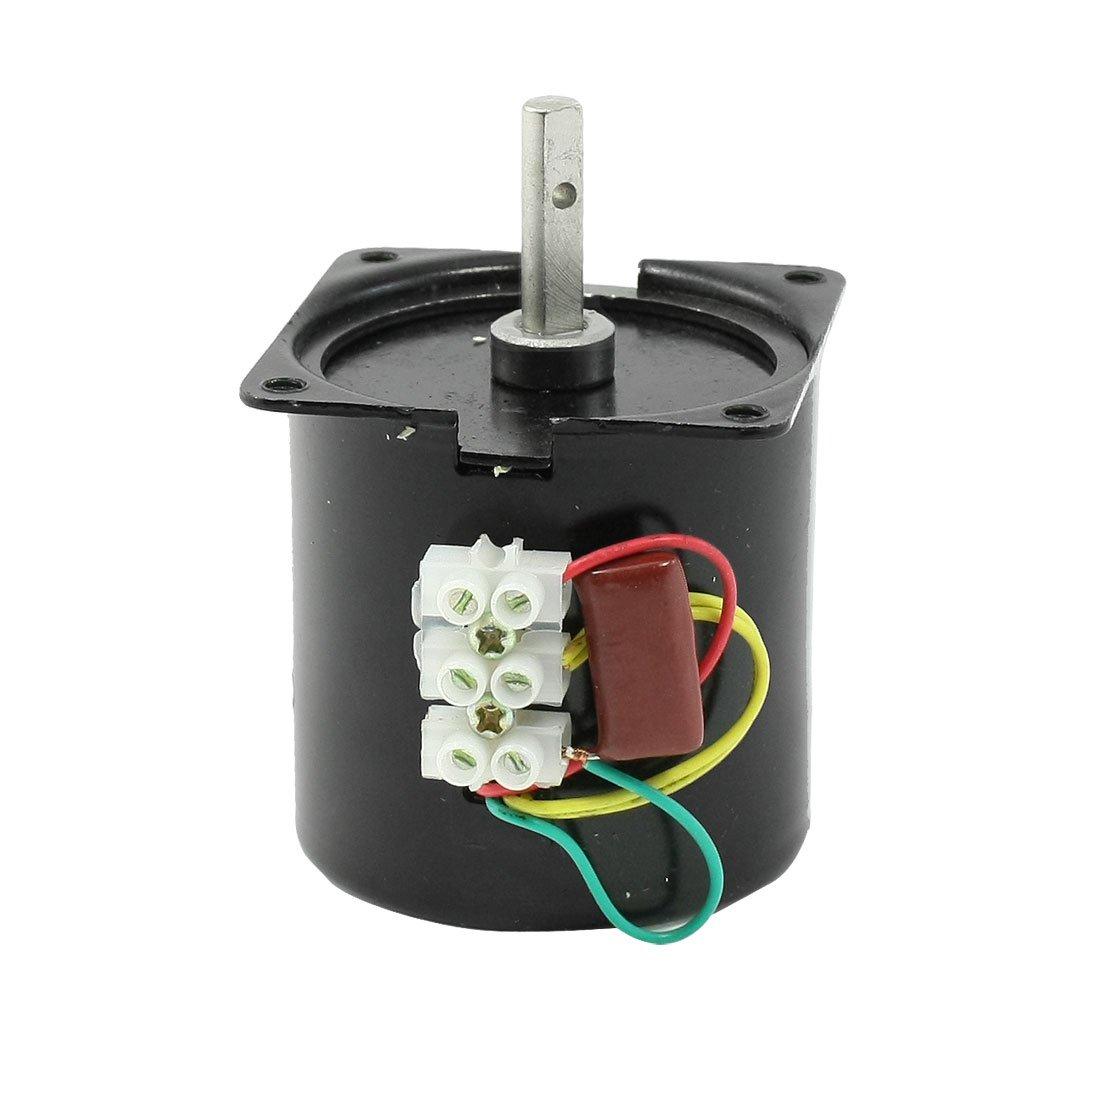 uxcell AC 220V 110RPM 14W 7mm Shaft Diameter Machine Synchronous Gear Motor